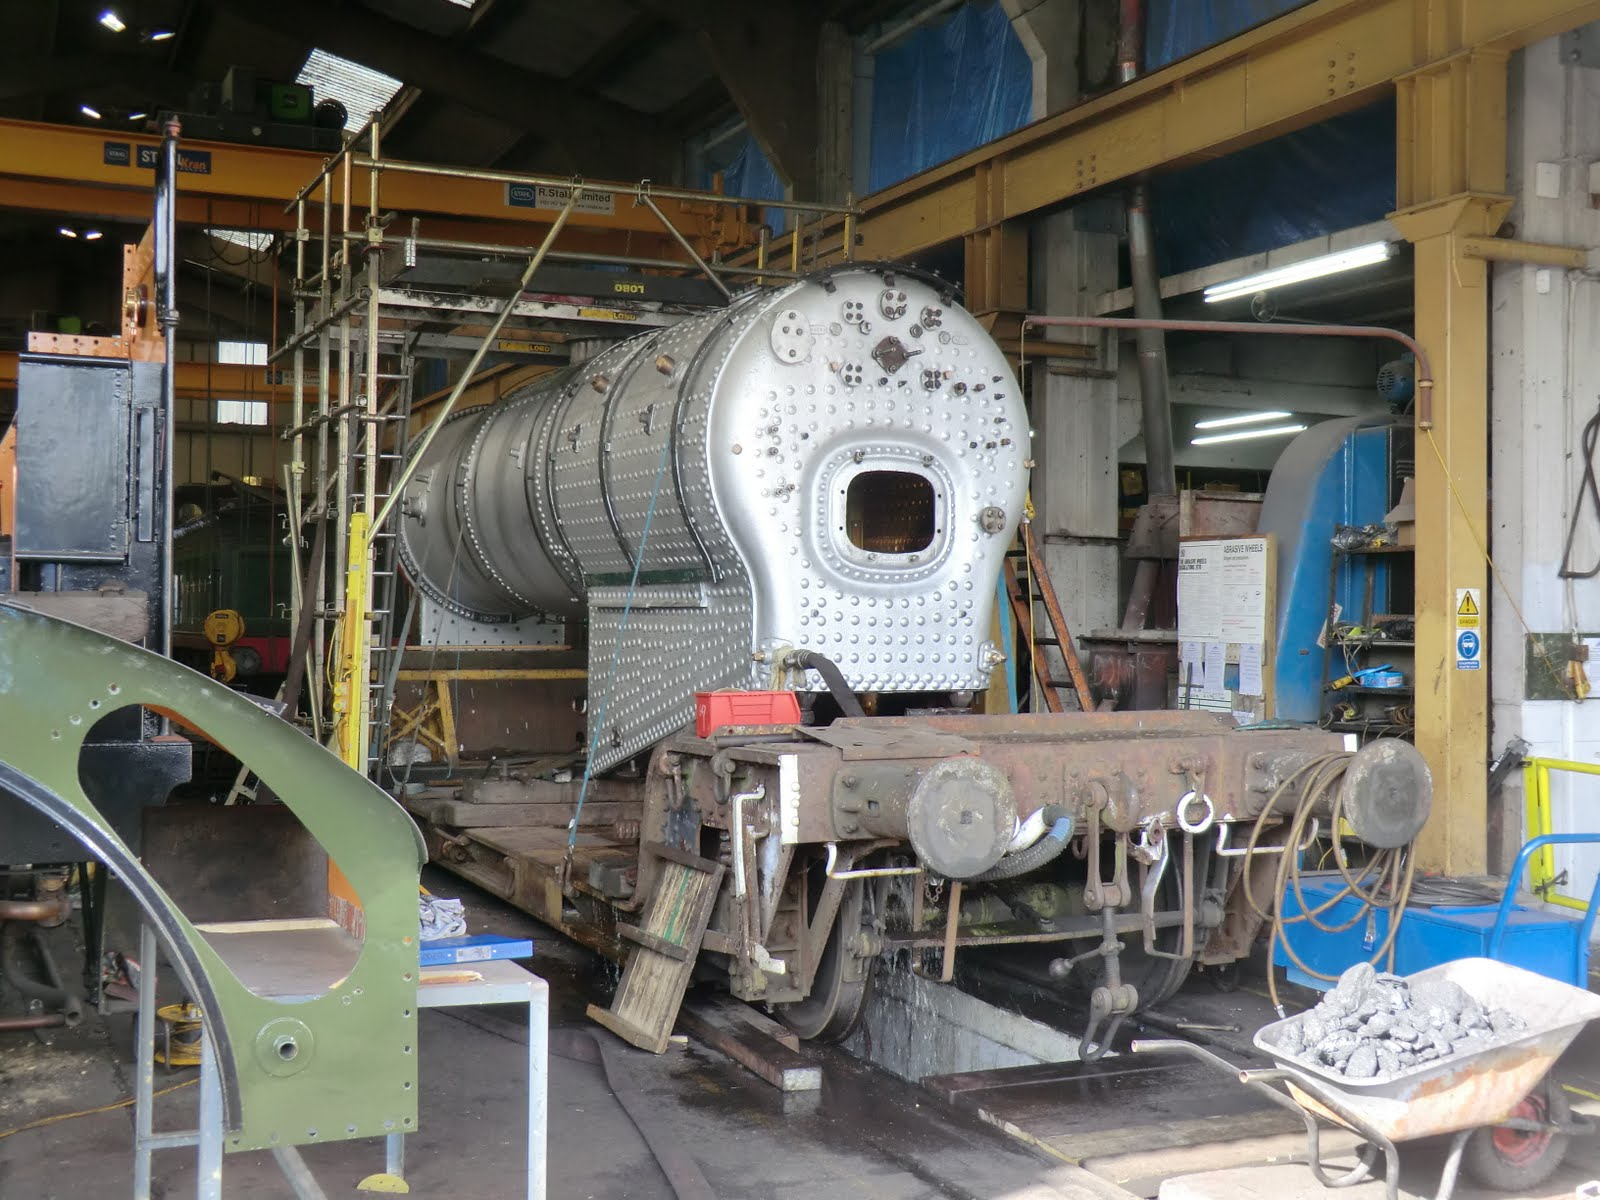 CIMG6220 Engine repairs at Sheffield Park loco shed